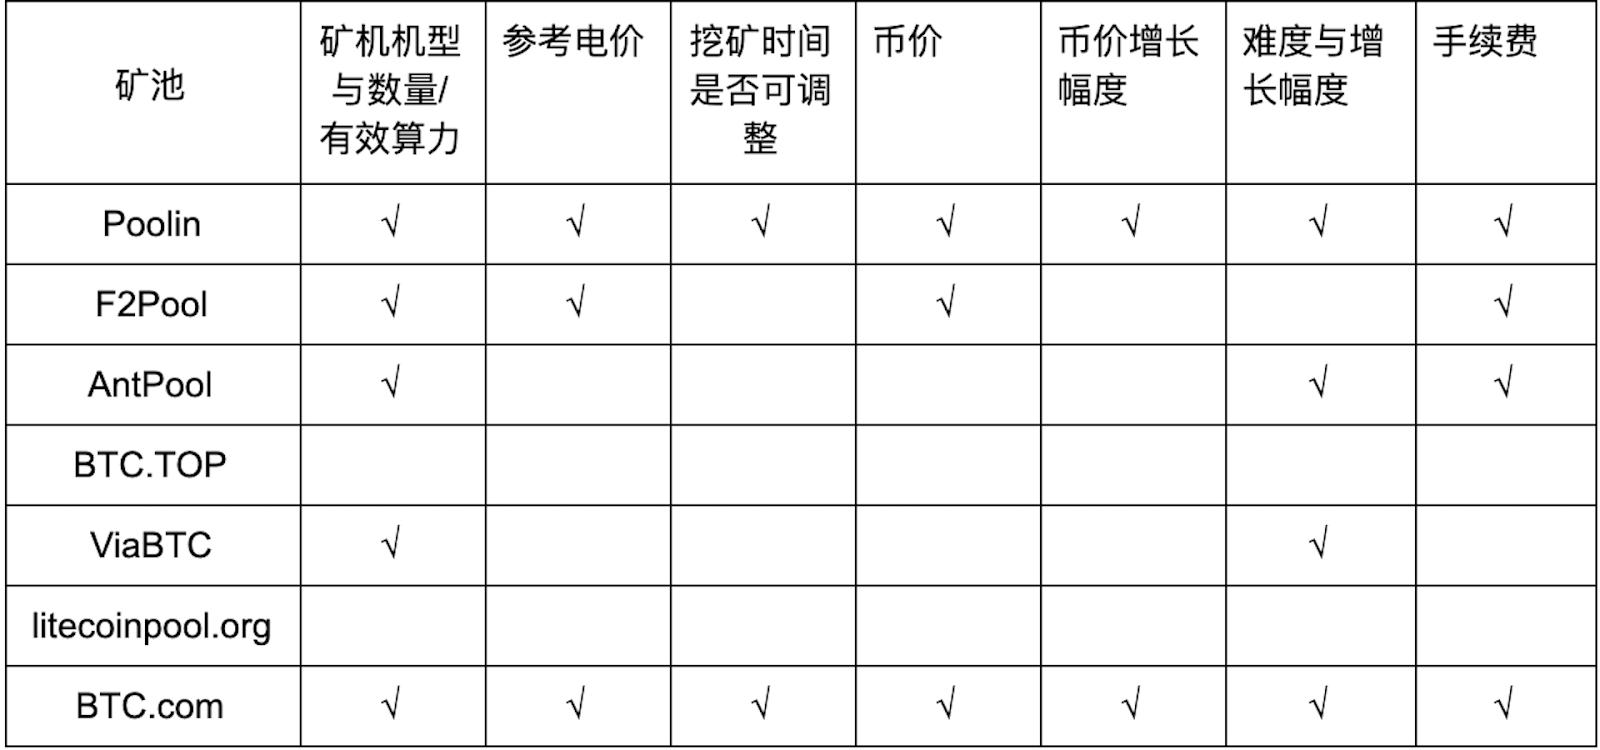 FrvipomZkRy ljGREcDDdu36 iOw - 【测评】莱特币矿池测评 | 第一期 | 矿池人性化服务